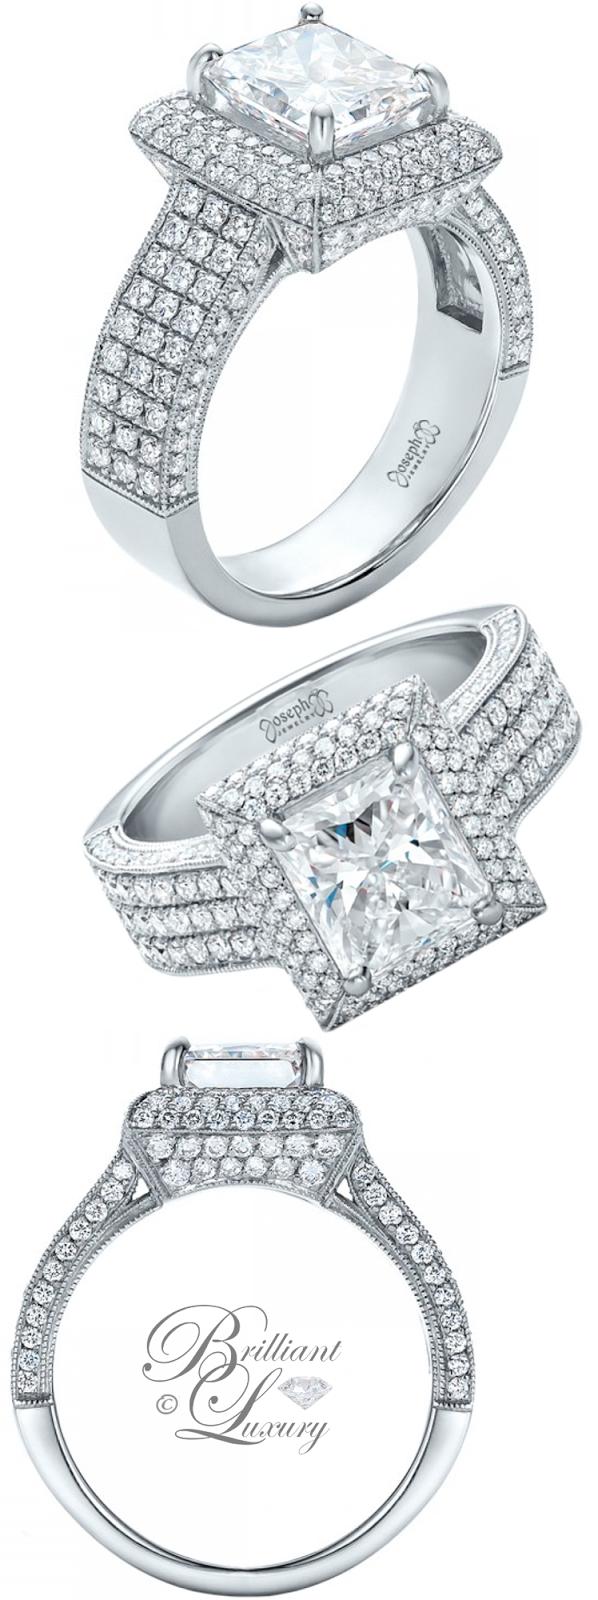 Brilliant Luxury ♦ Joseph Jewelry Custom Micro-Pave Halo Diamond Engagement Ring